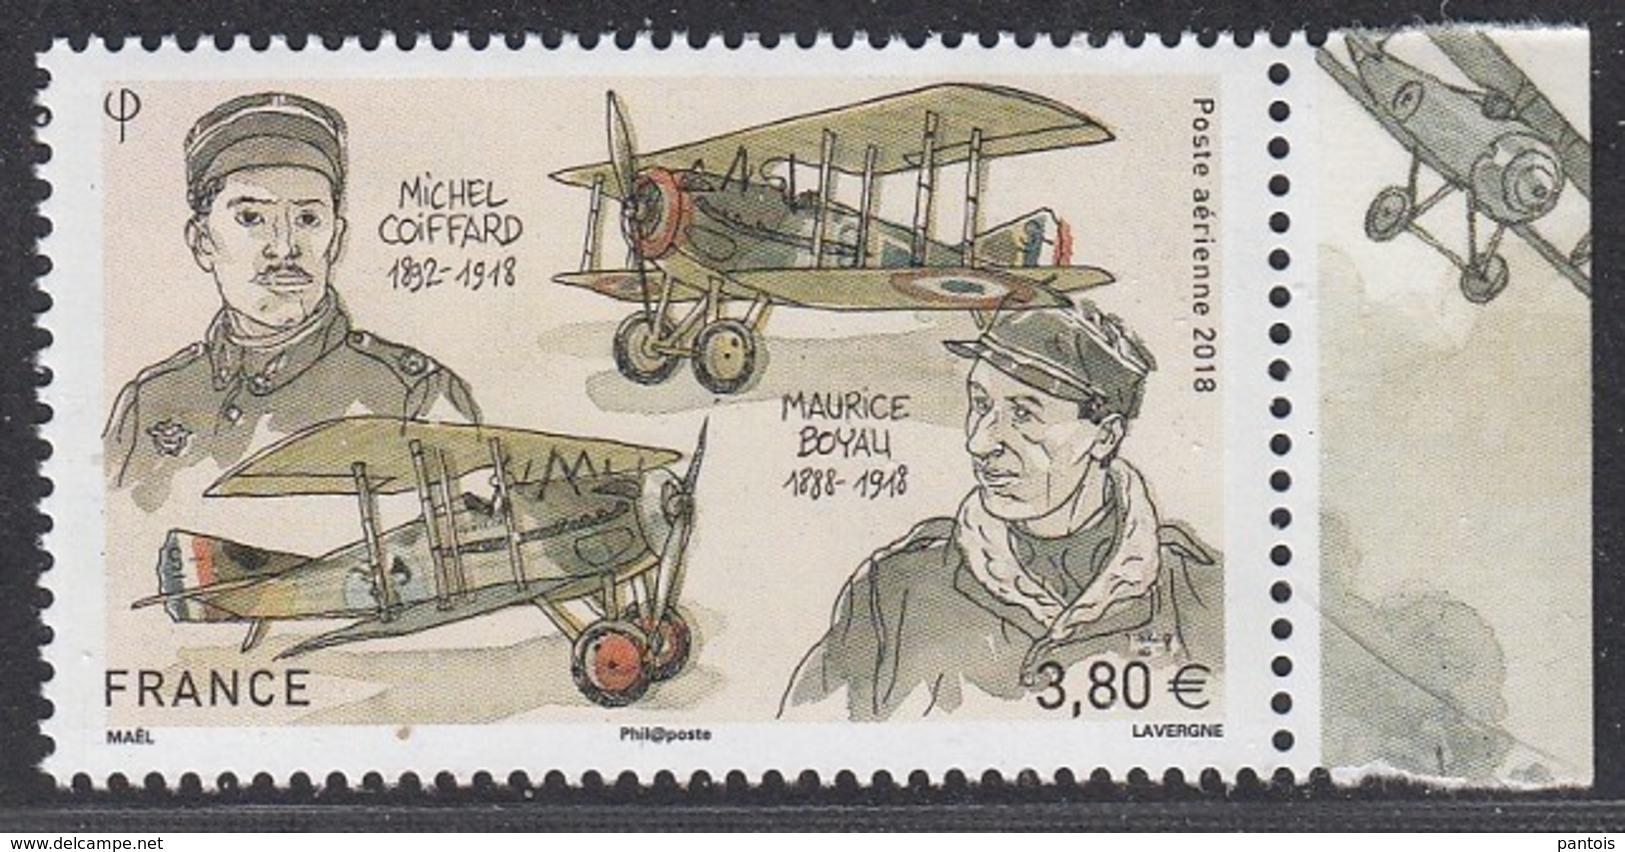 2018 Michel Coiffard Et Maurice Boyau Timbre Issu Du Feuillet De 10 ** - Poste Aérienne